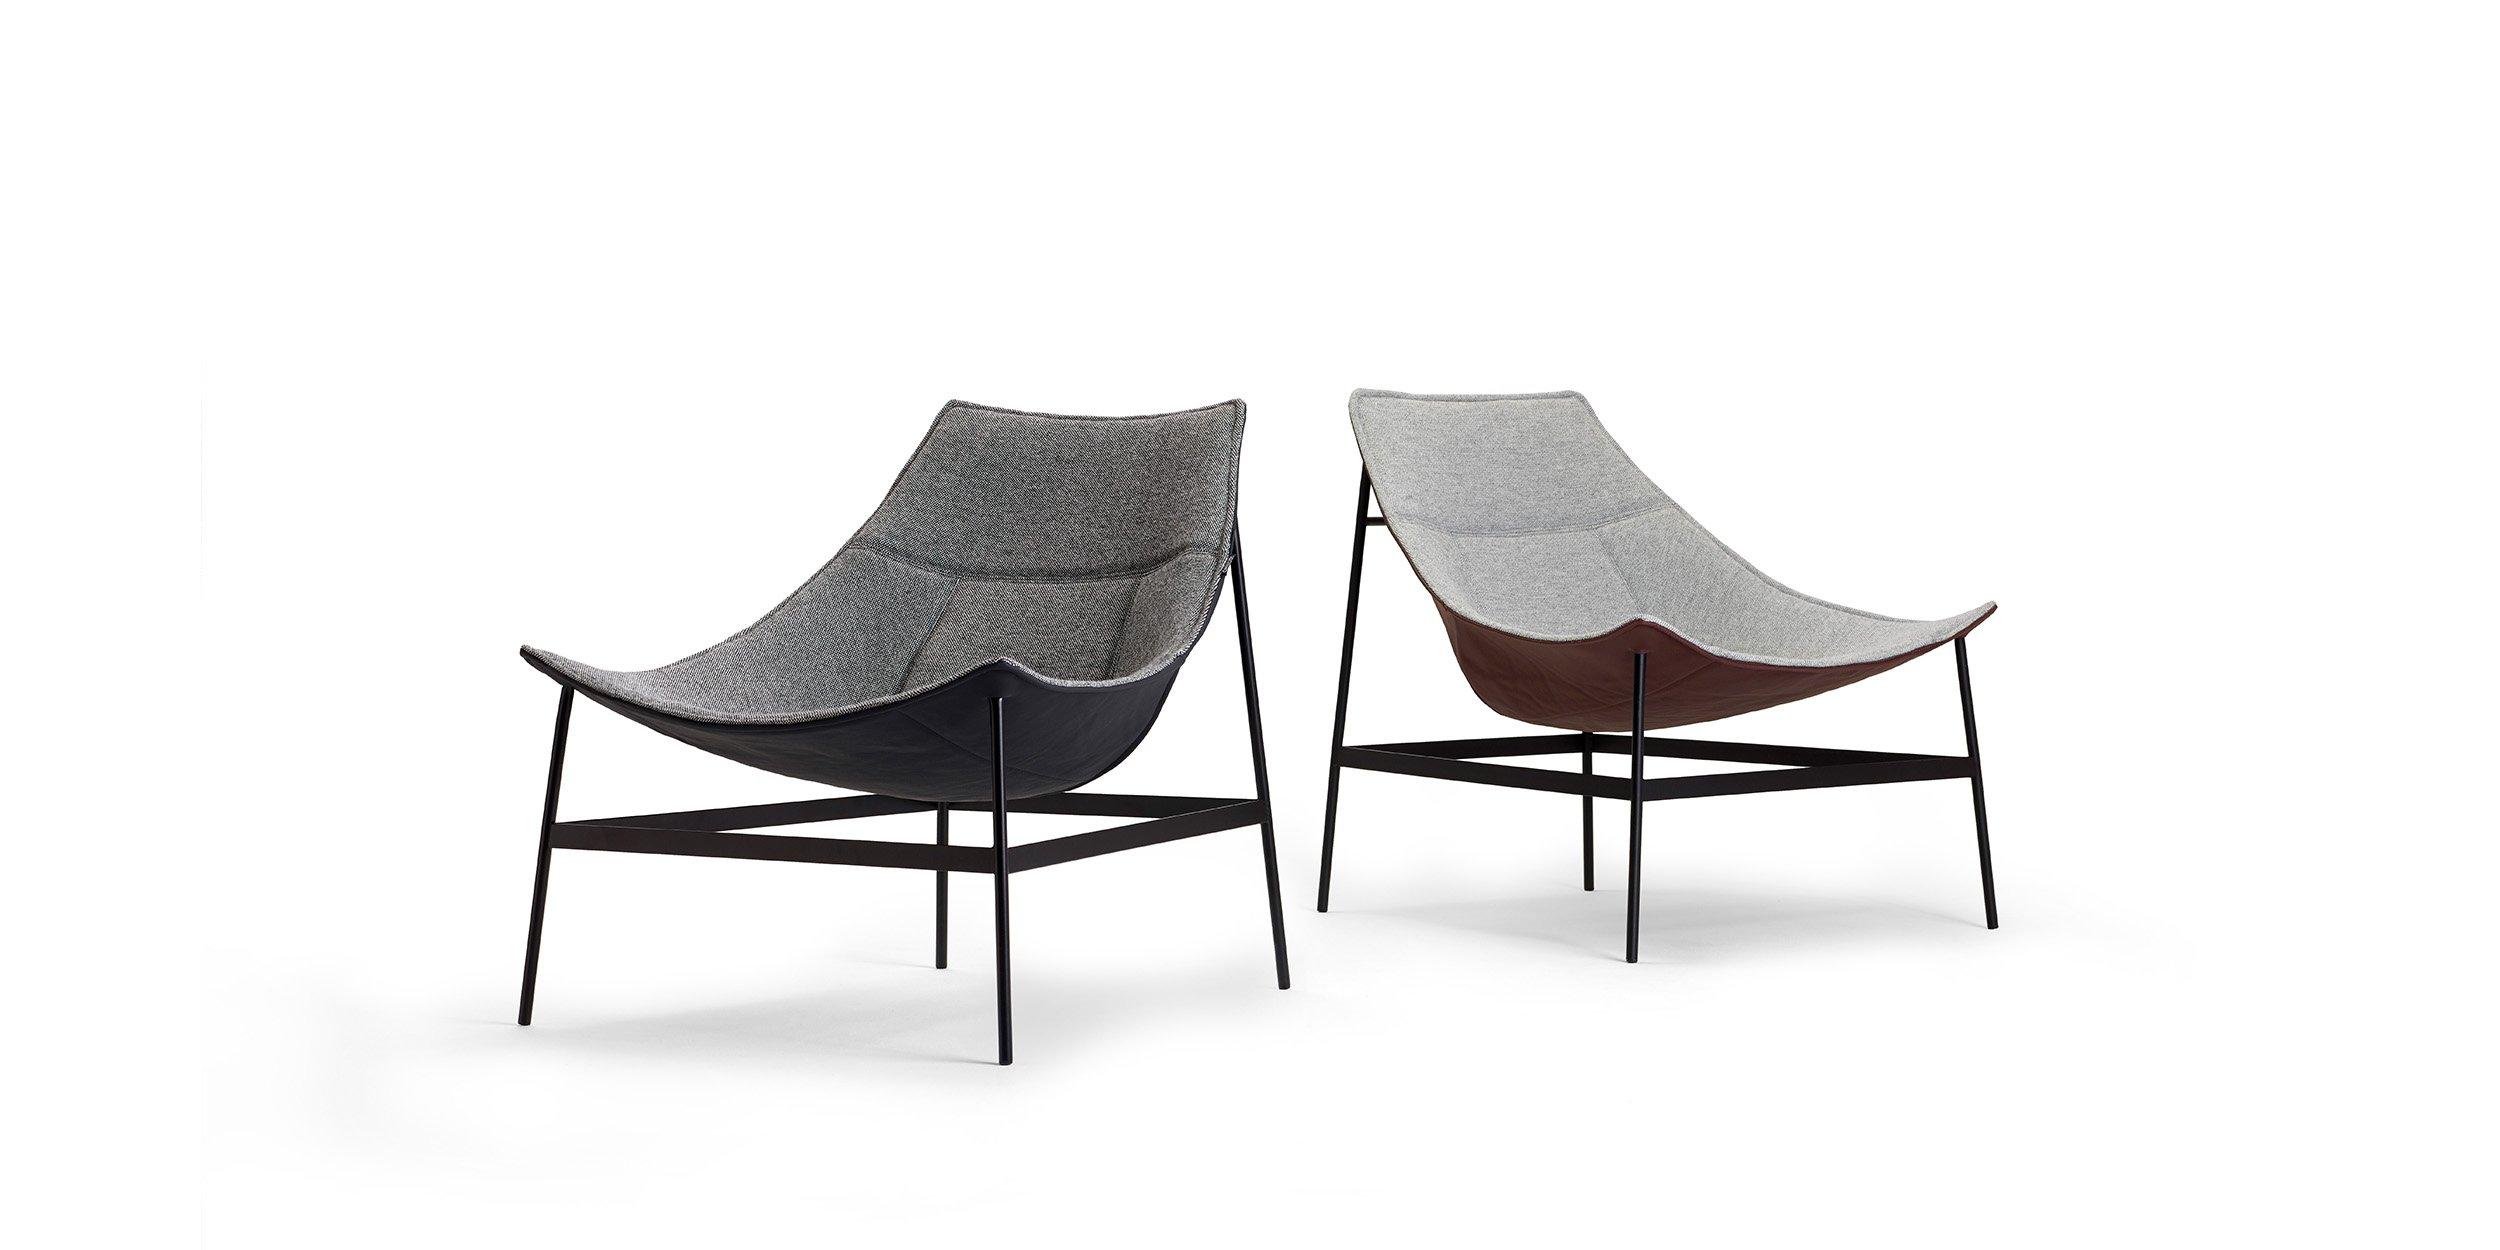 MONTPARNASSE-Easy-chairs-Christophe-Pillet-offecct-607110-9-12398